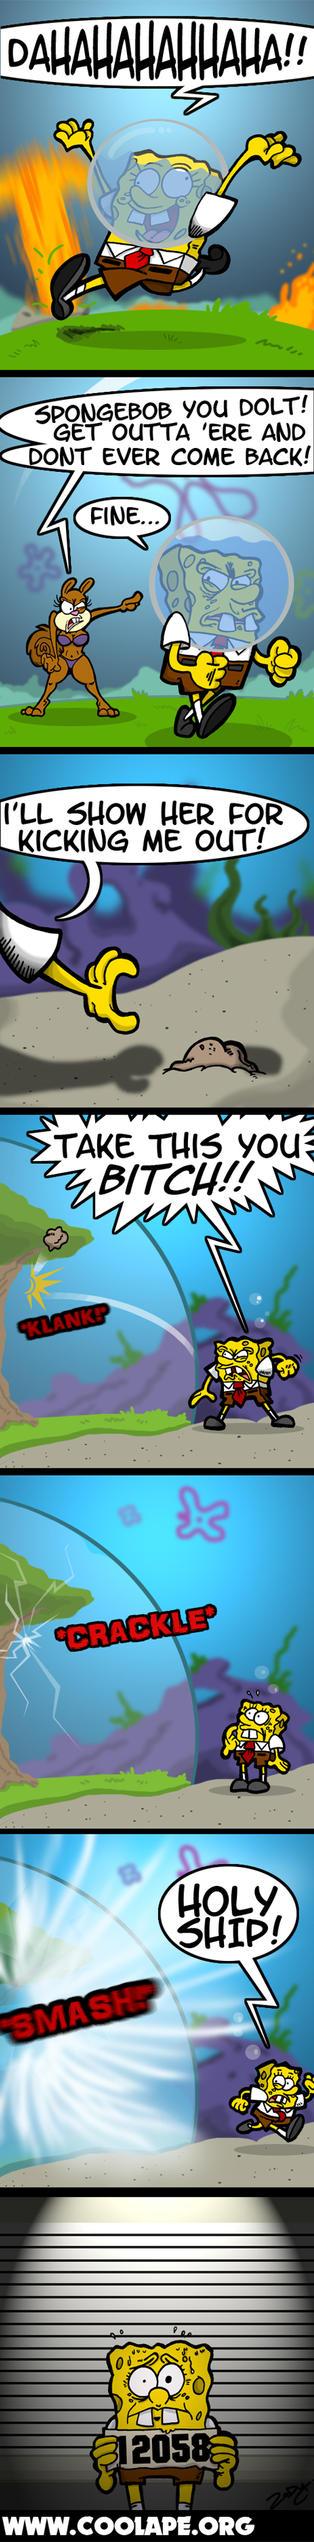 spongebob rocks by zody on deviantart